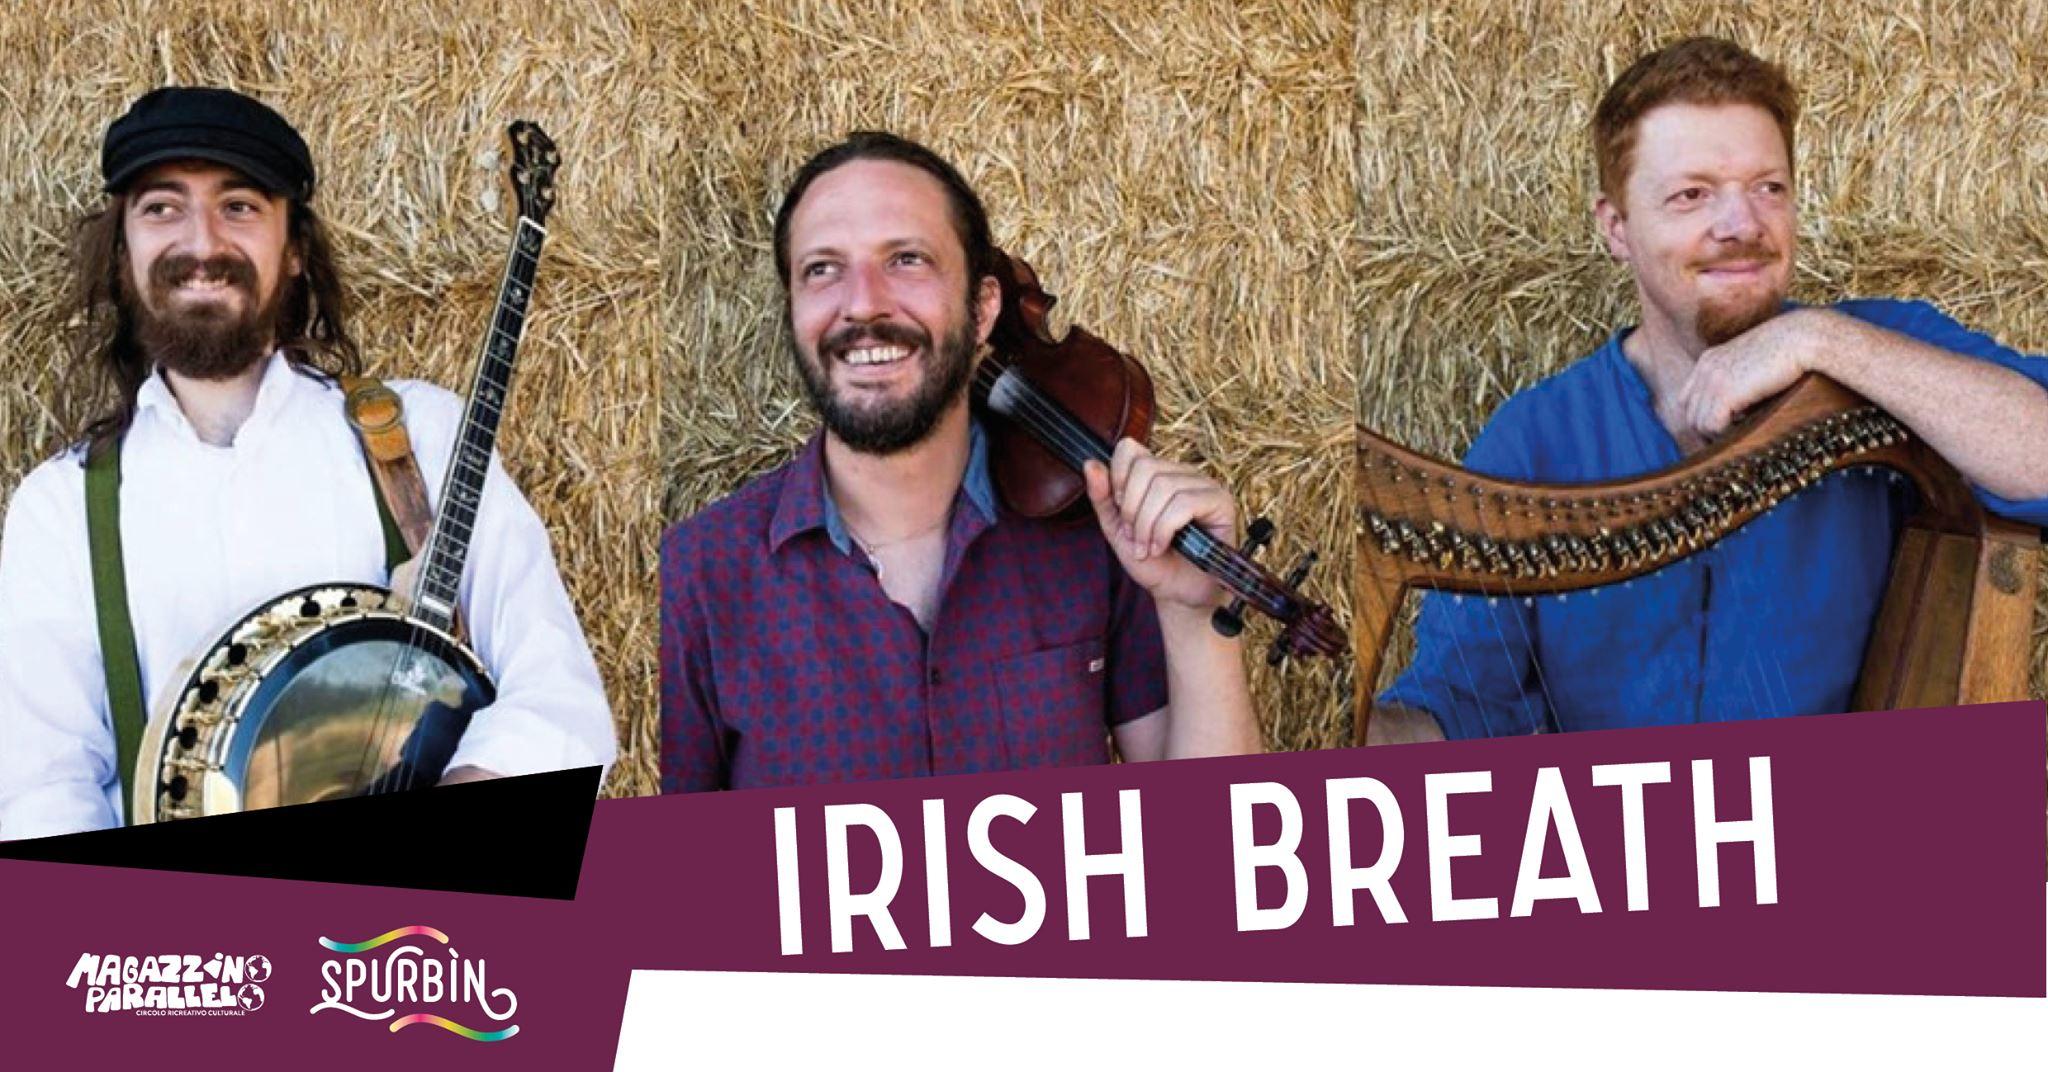 Irish Breath - Music and Dances / at Spurbìn